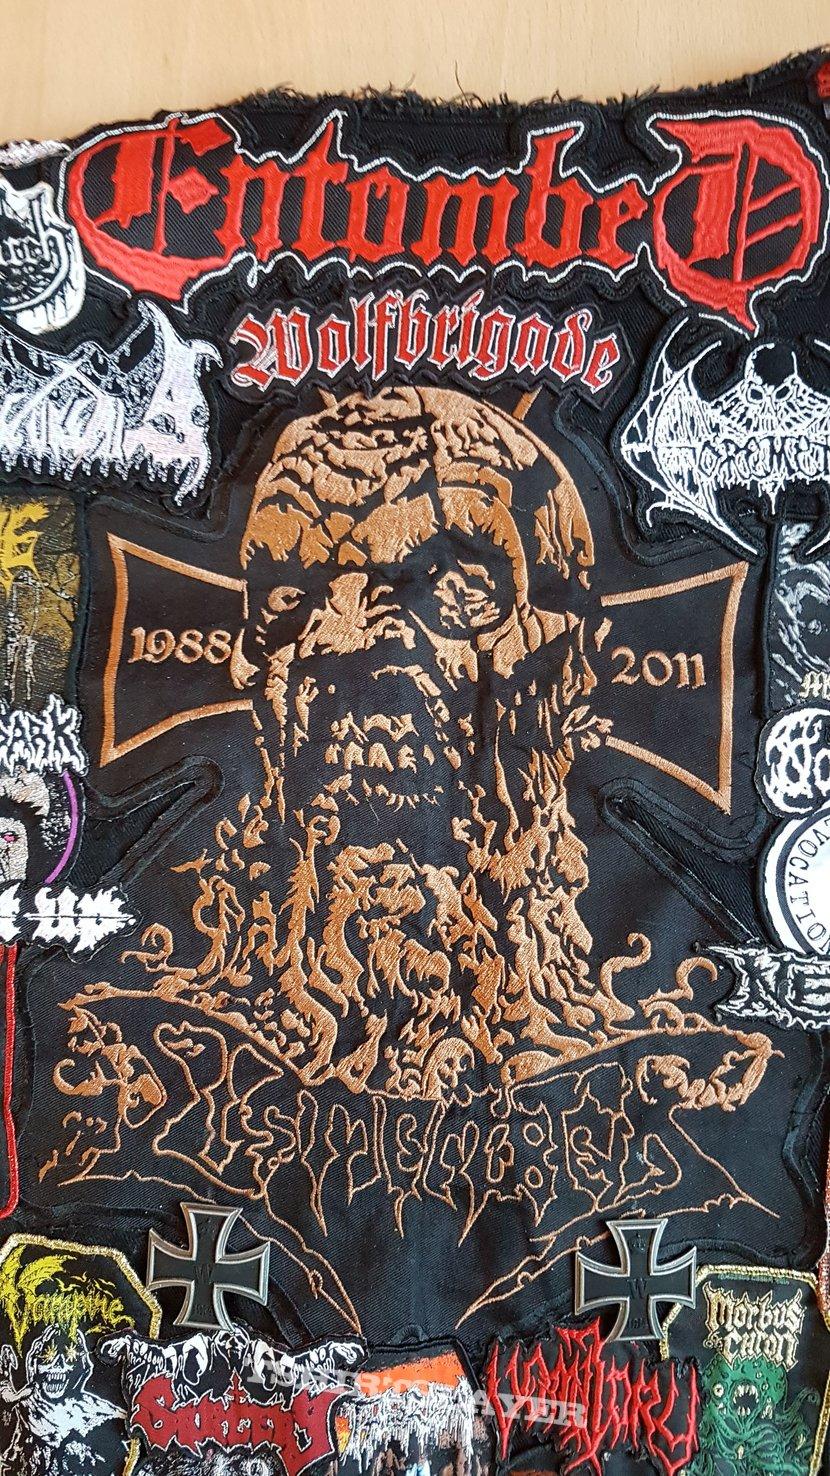 The Skinfather - Swedish Supremacy